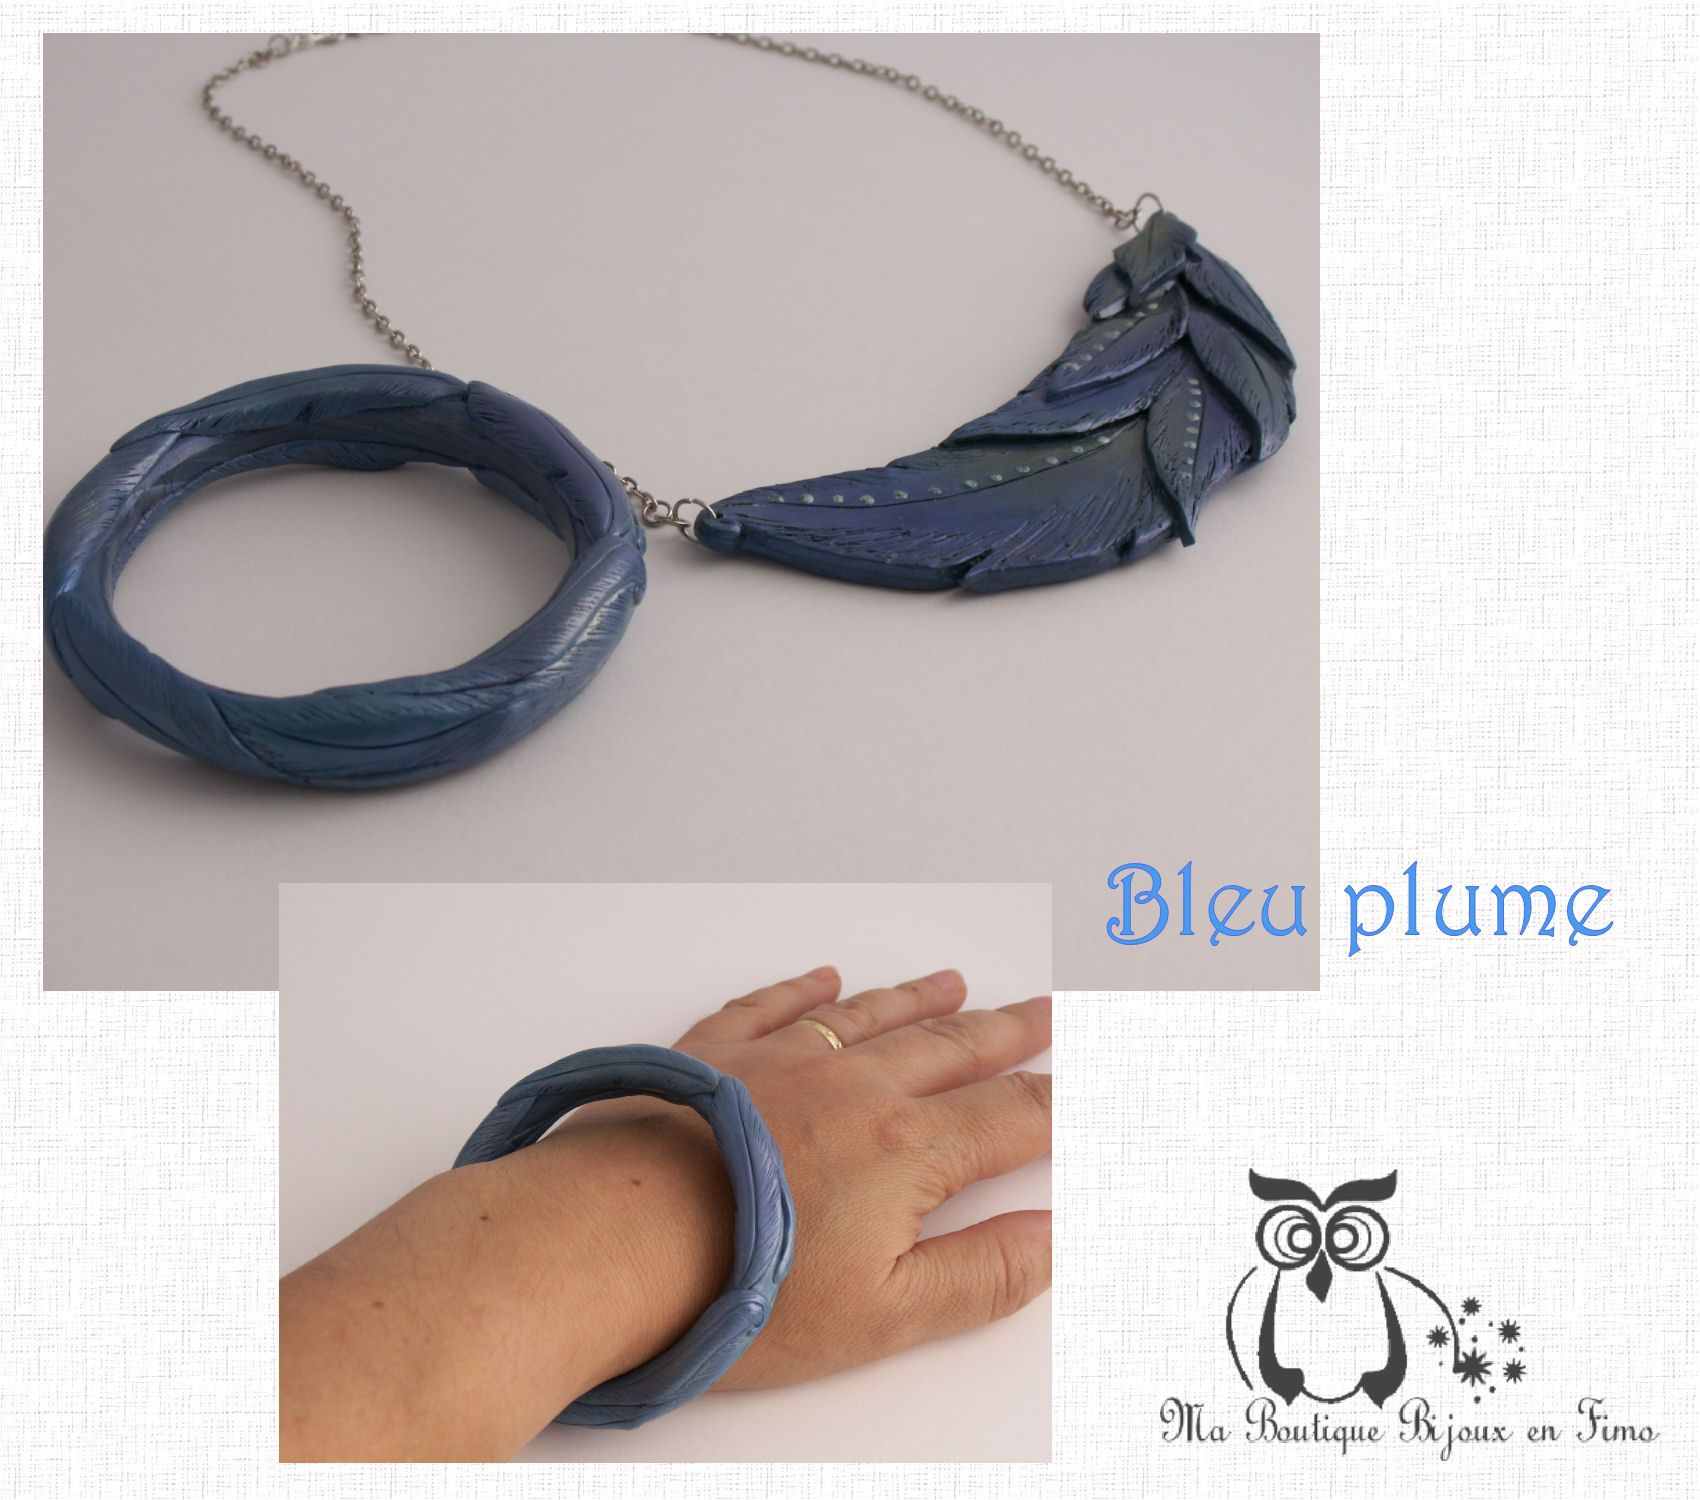 Le Bracelet bleu plume